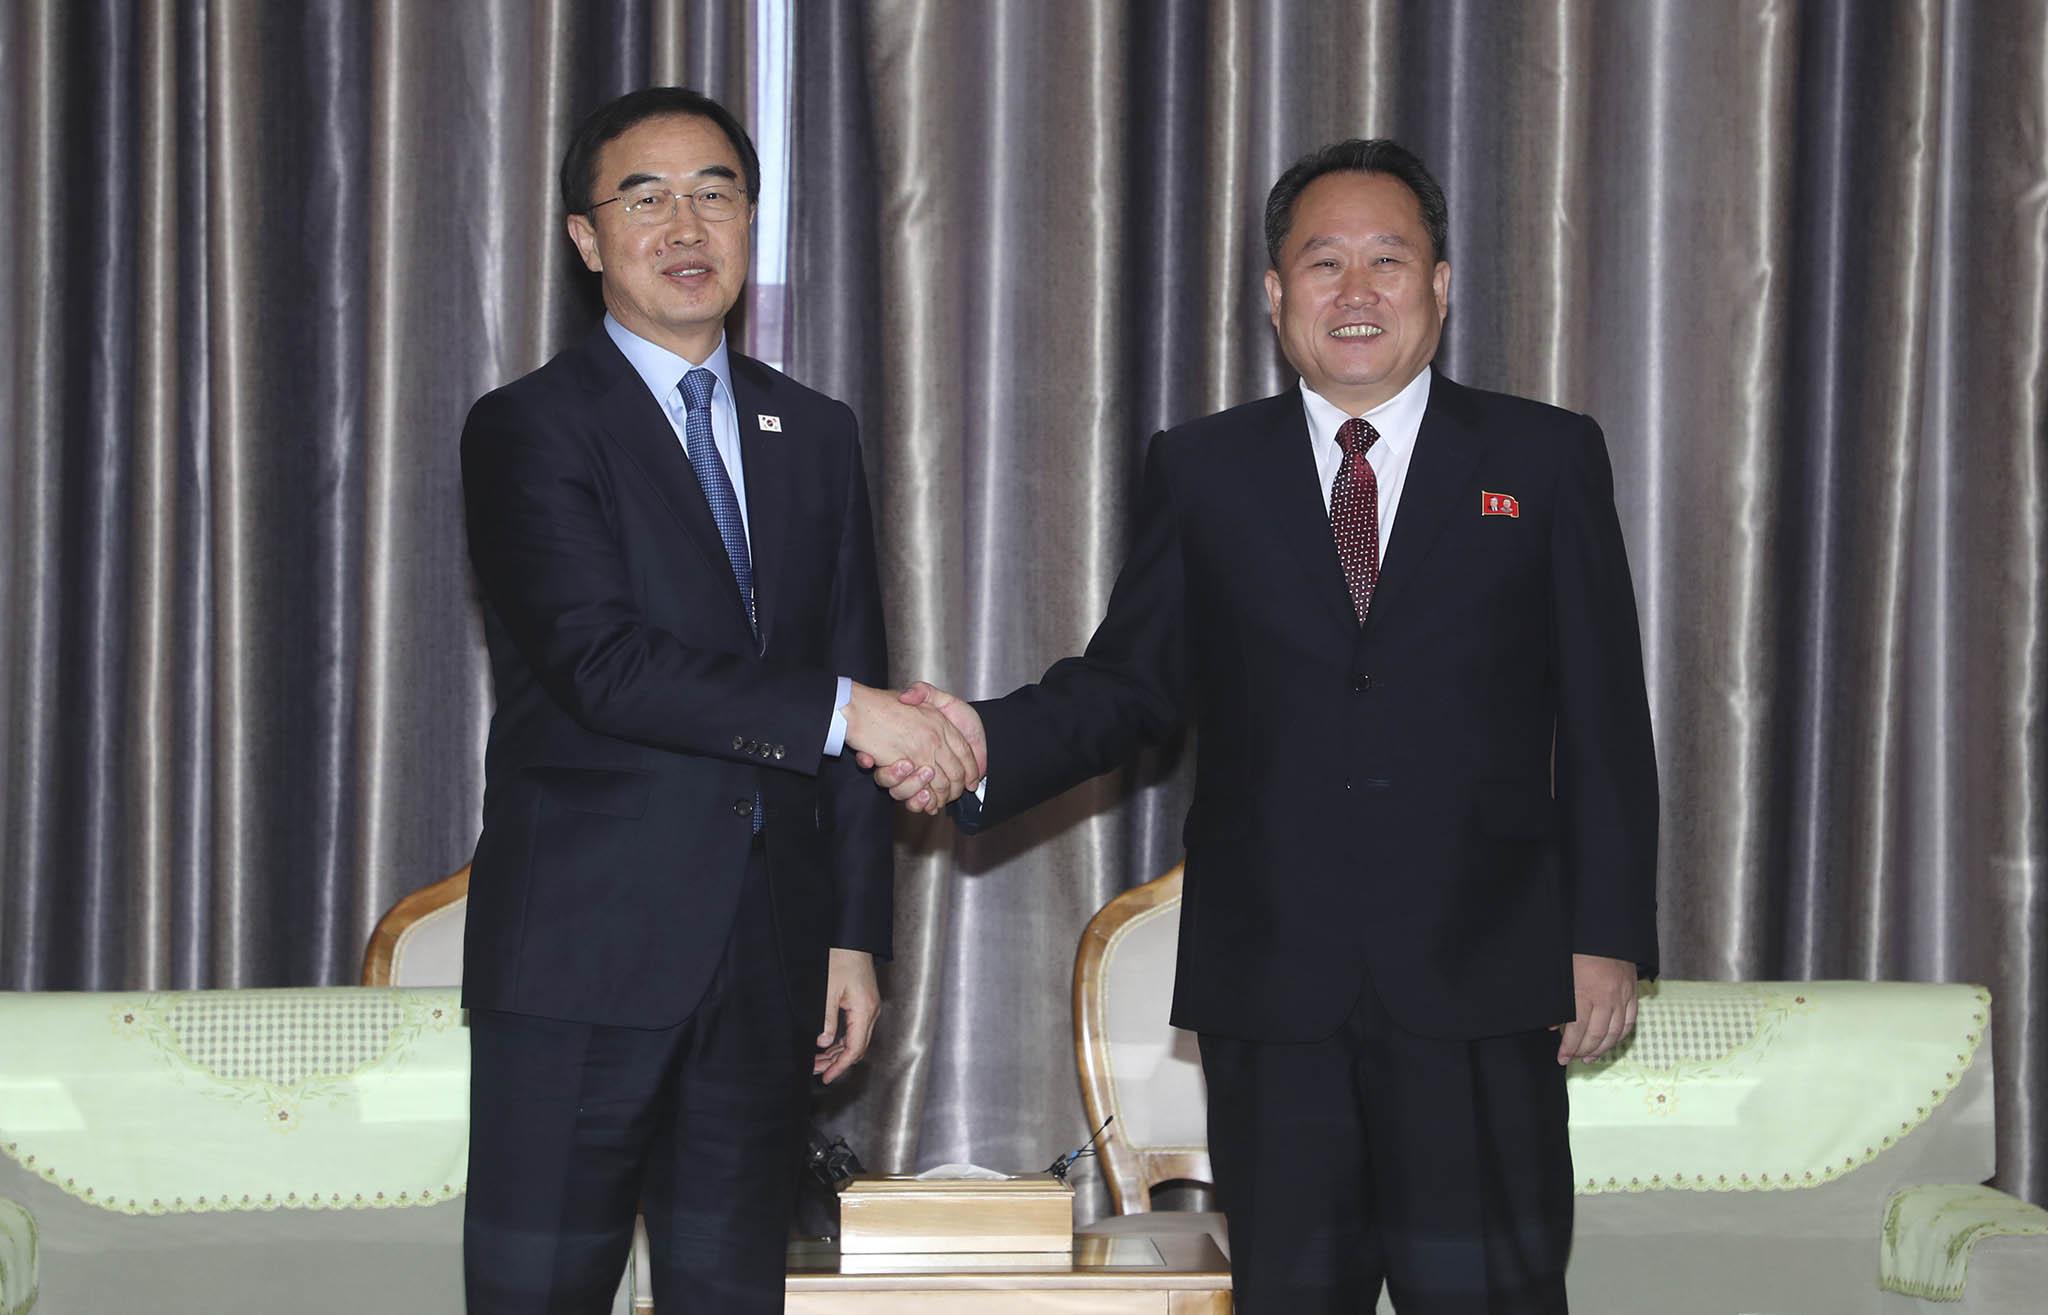 Representantes da Coreia do Sul visitam Pyongyang